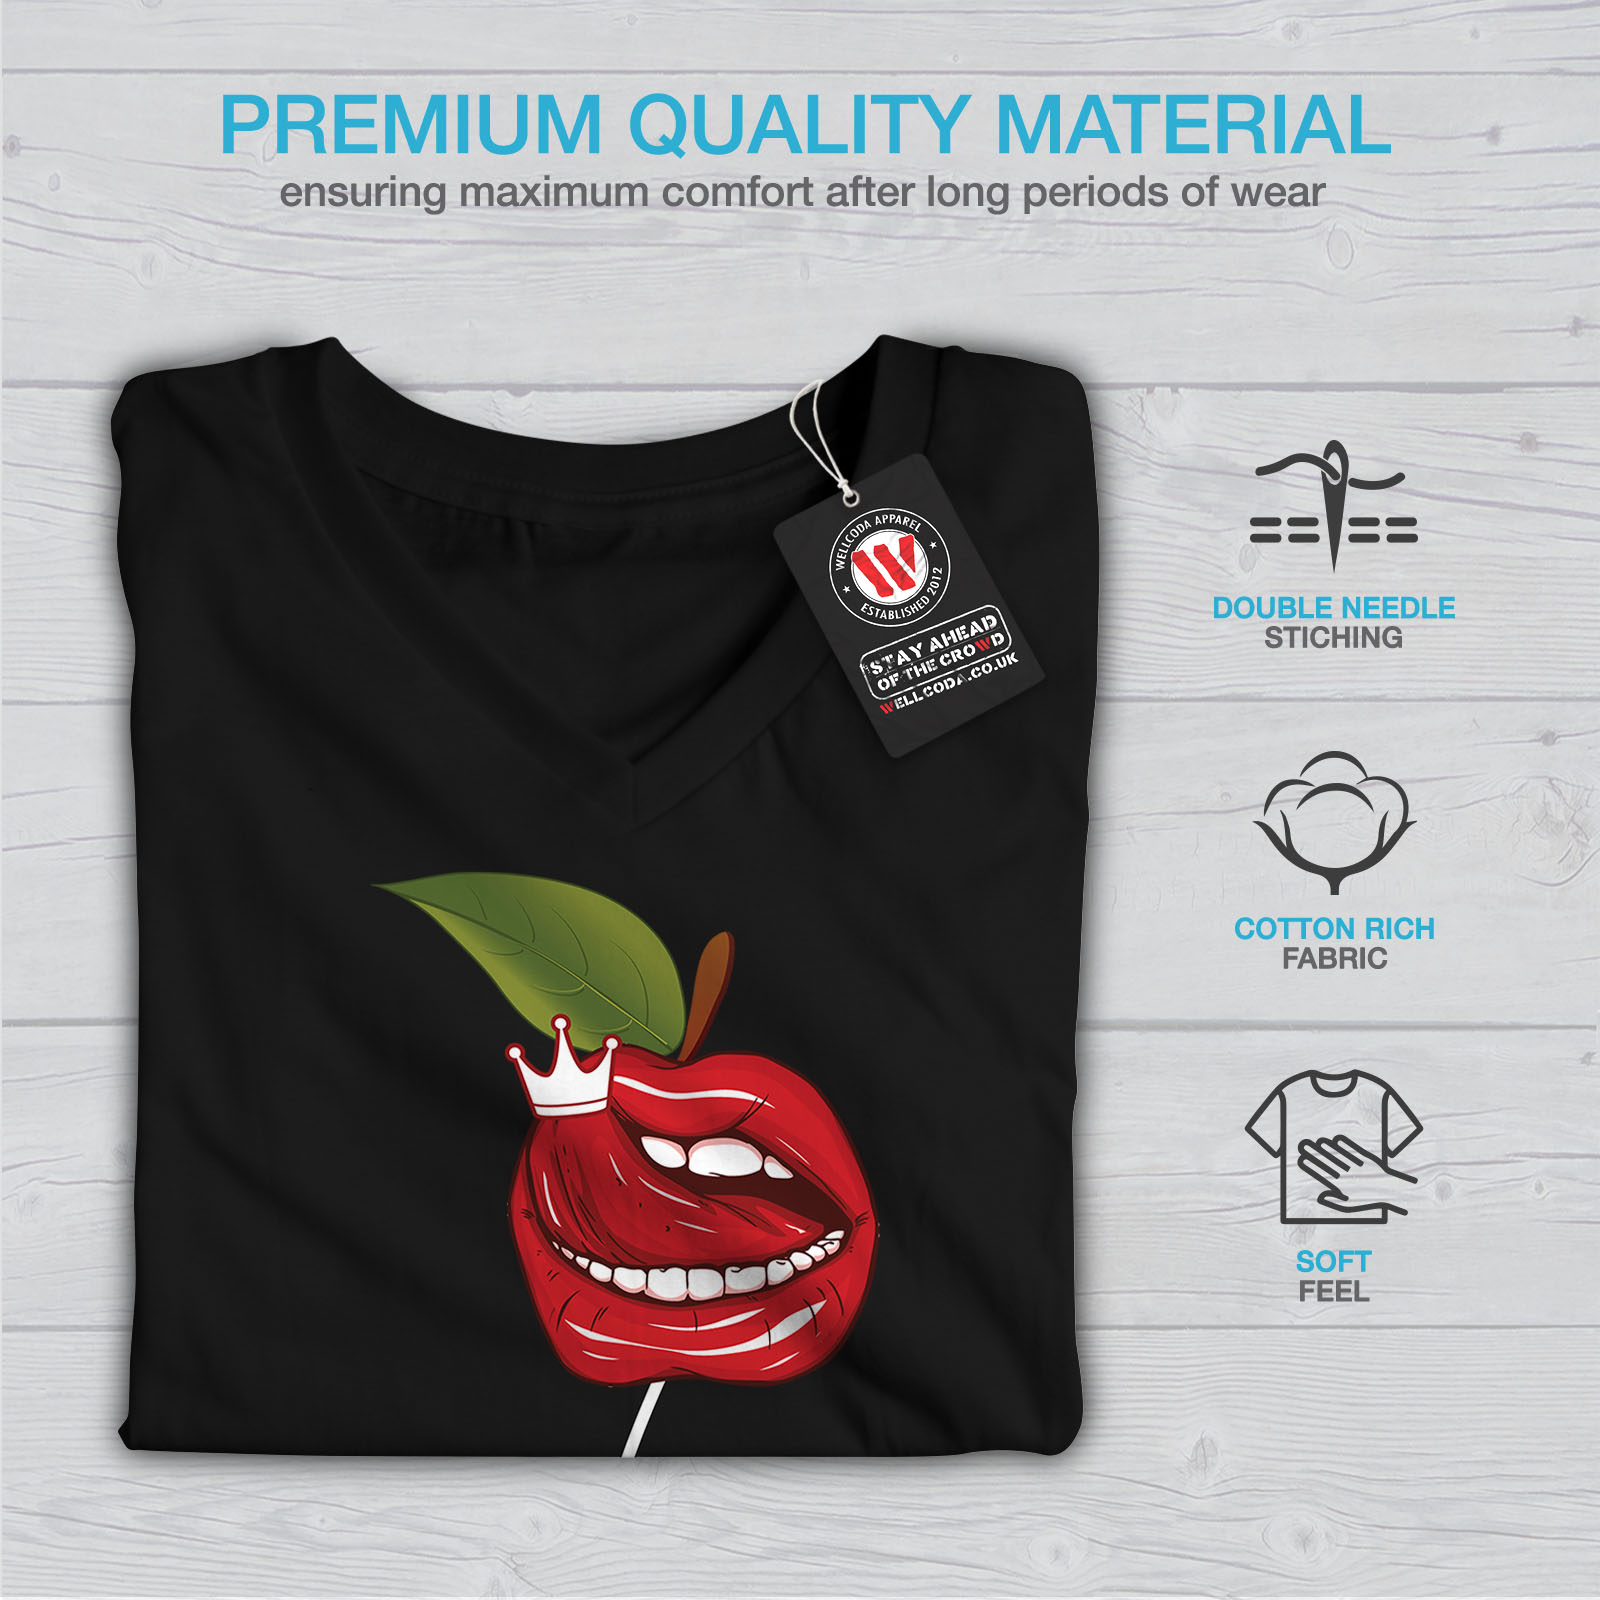 Wellcoda-Lip-Cherry-Cool-Womens-V-Neck-T-shirt-Rock-amp-Roll-Graphic-Design-Tee thumbnail 5